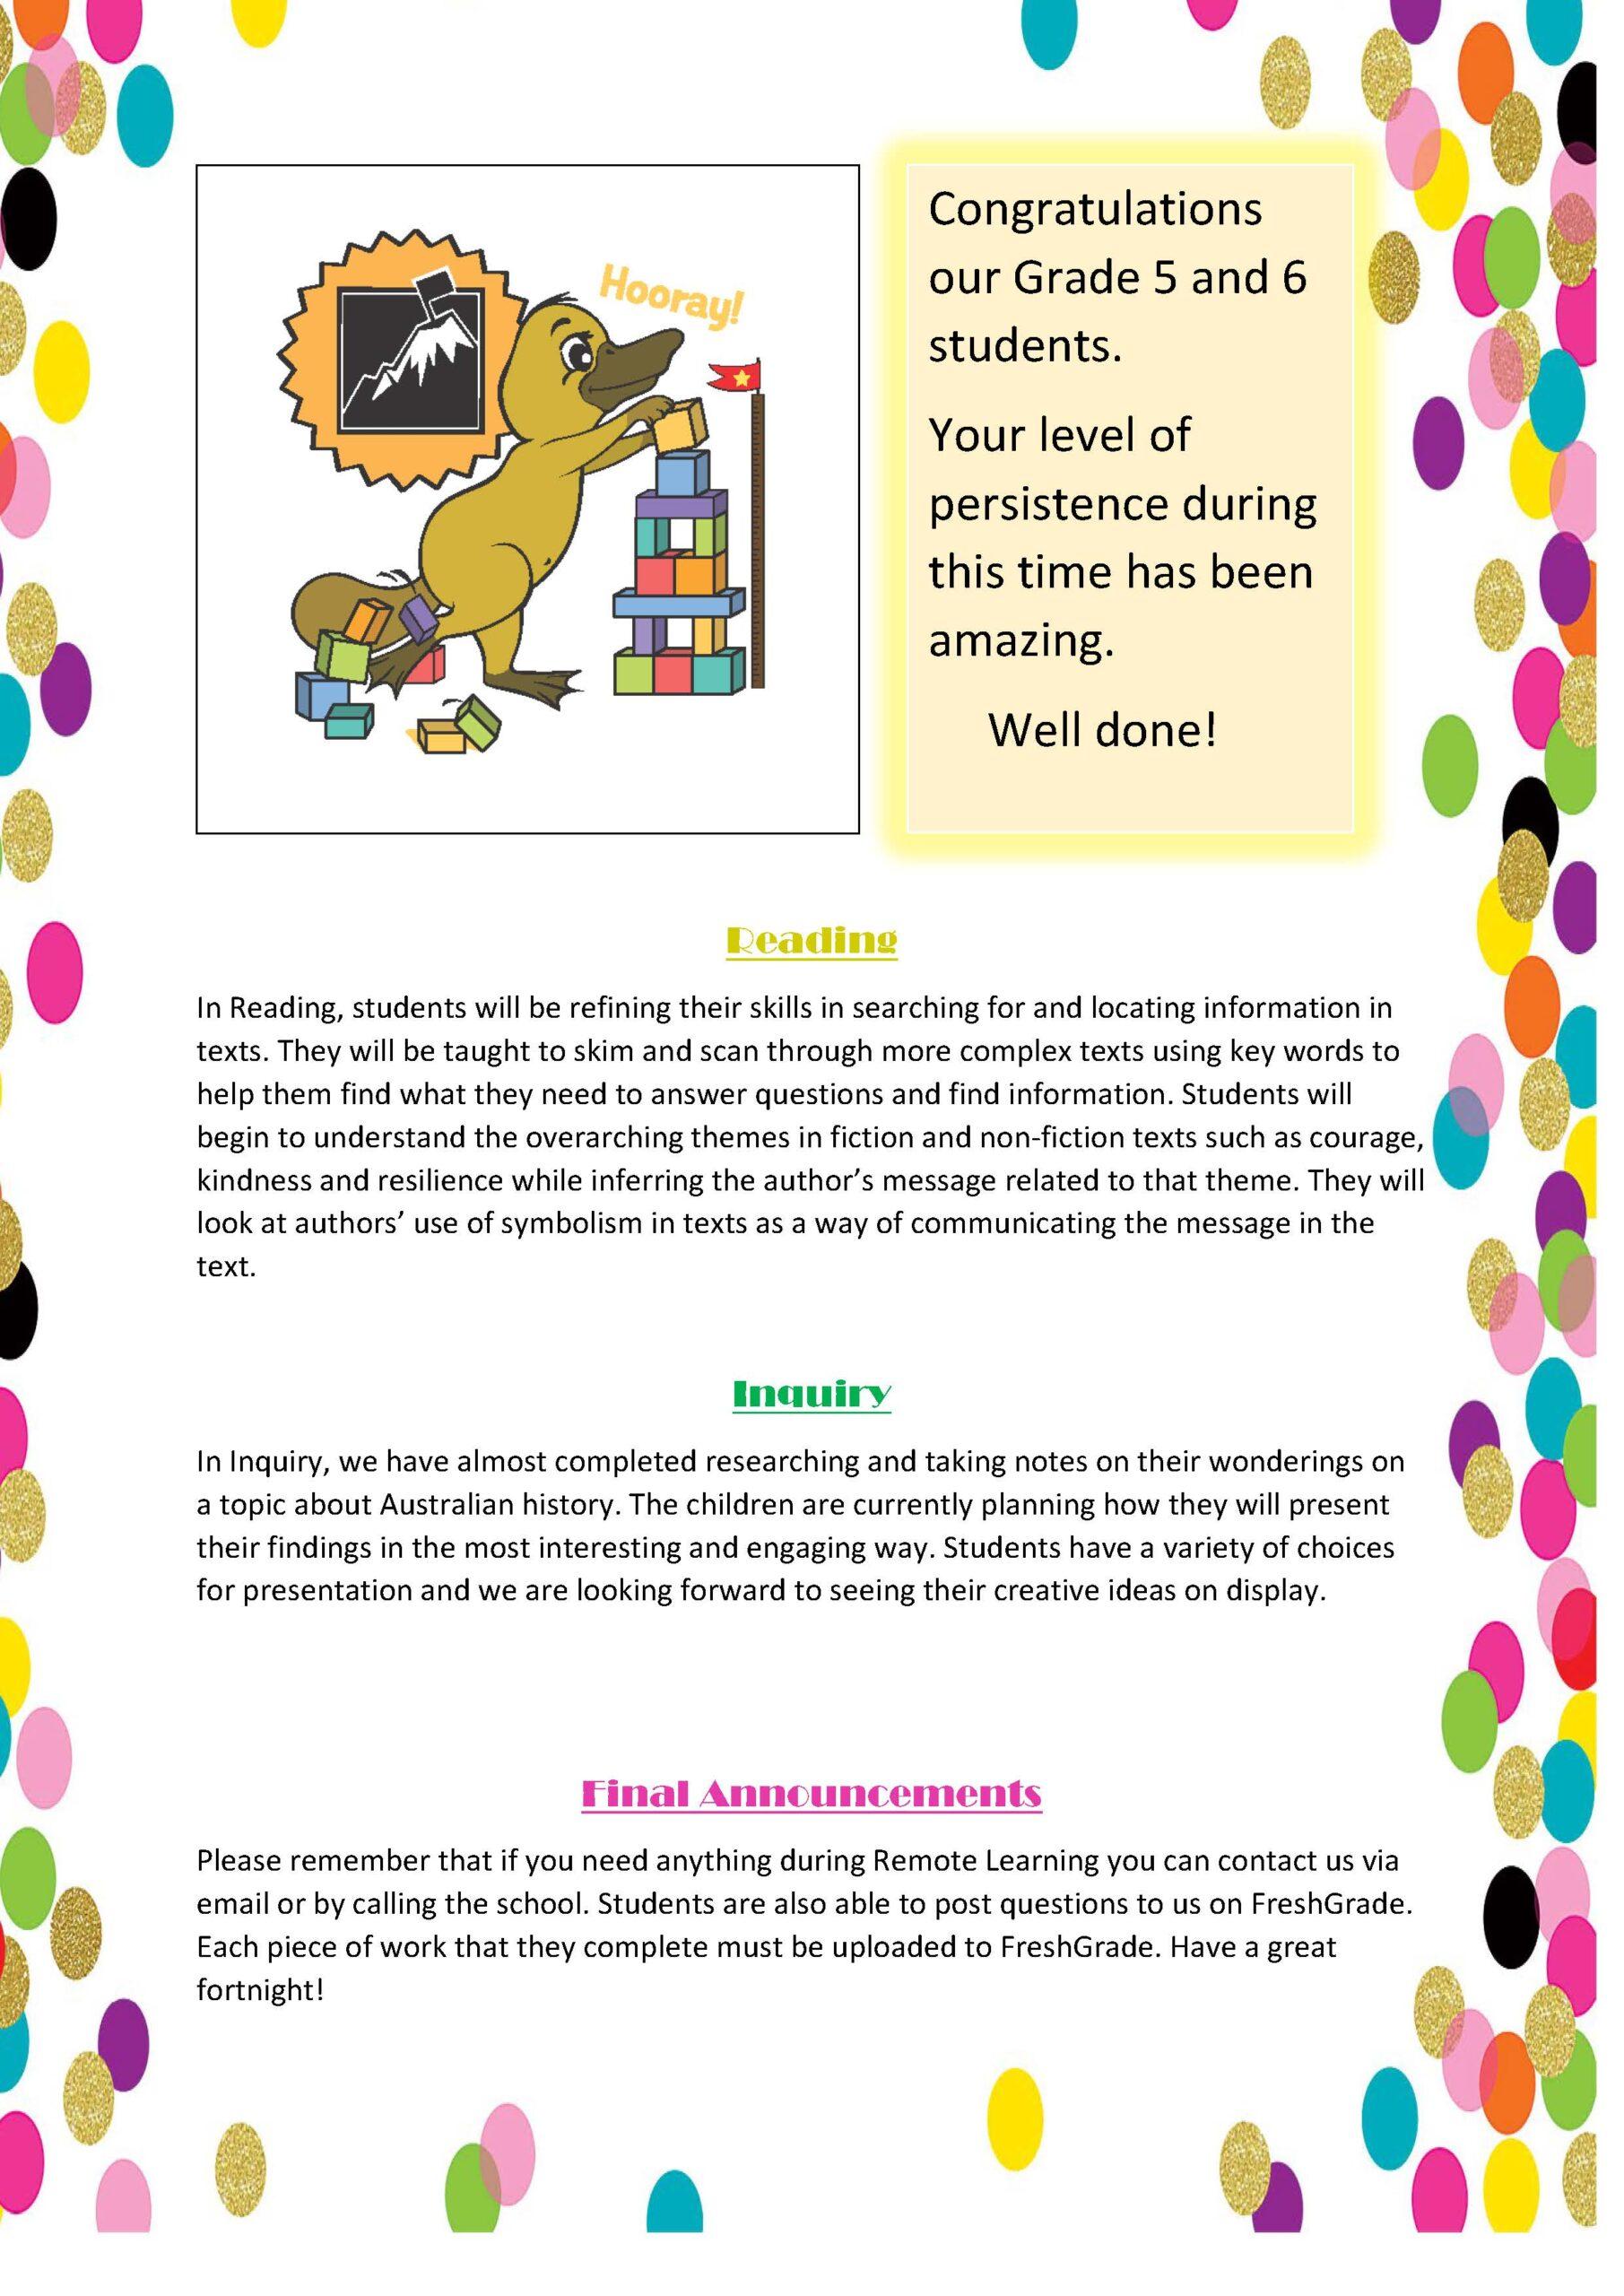 Grade 5/6 Term 2, 2020 Newsletter #3